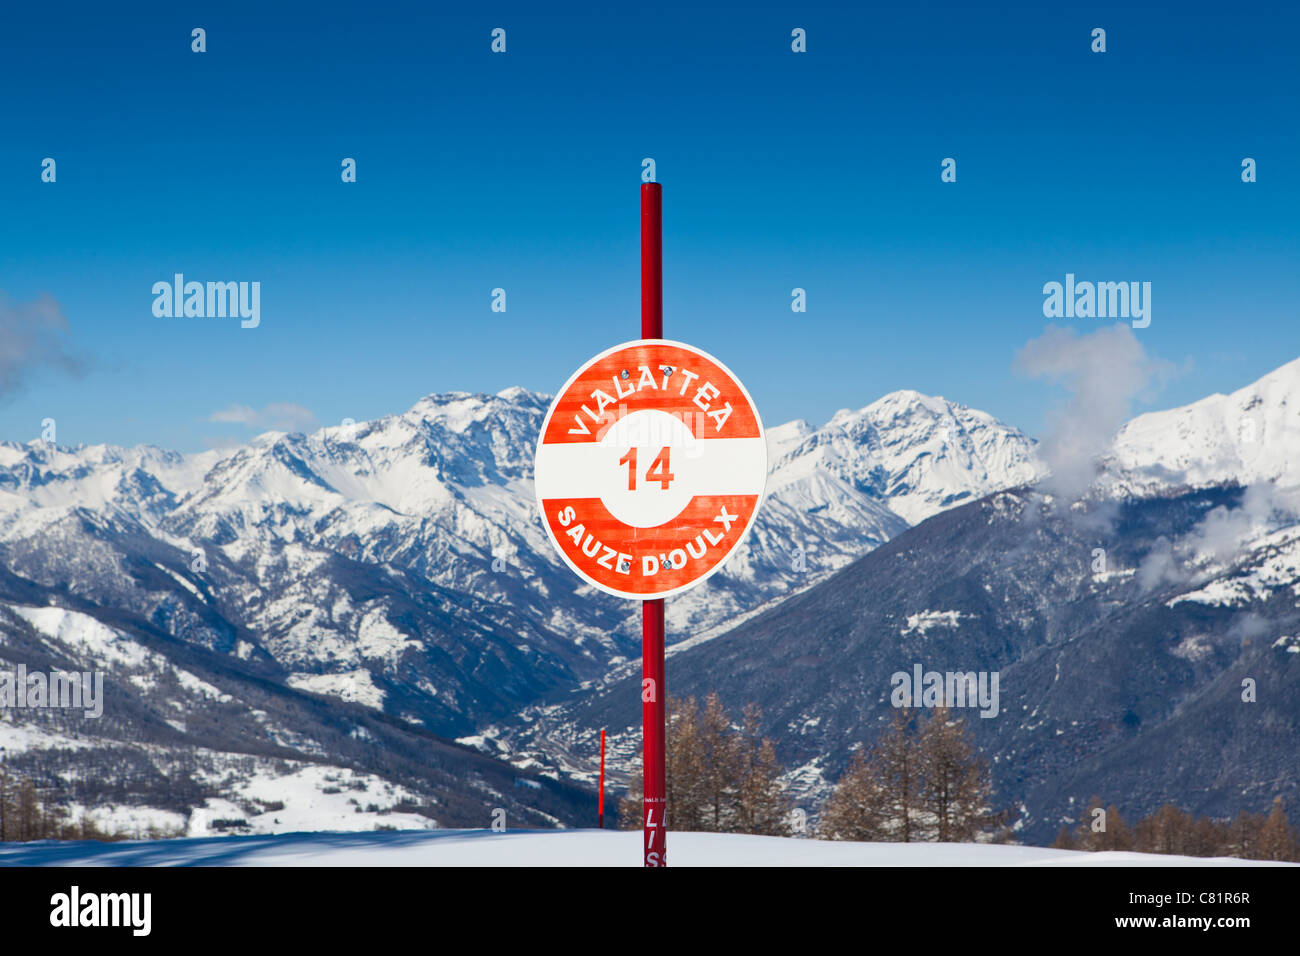 Marcatore di pista Via Lattea, Sauze d'Oulx, Piemonte, Italia Immagini Stock